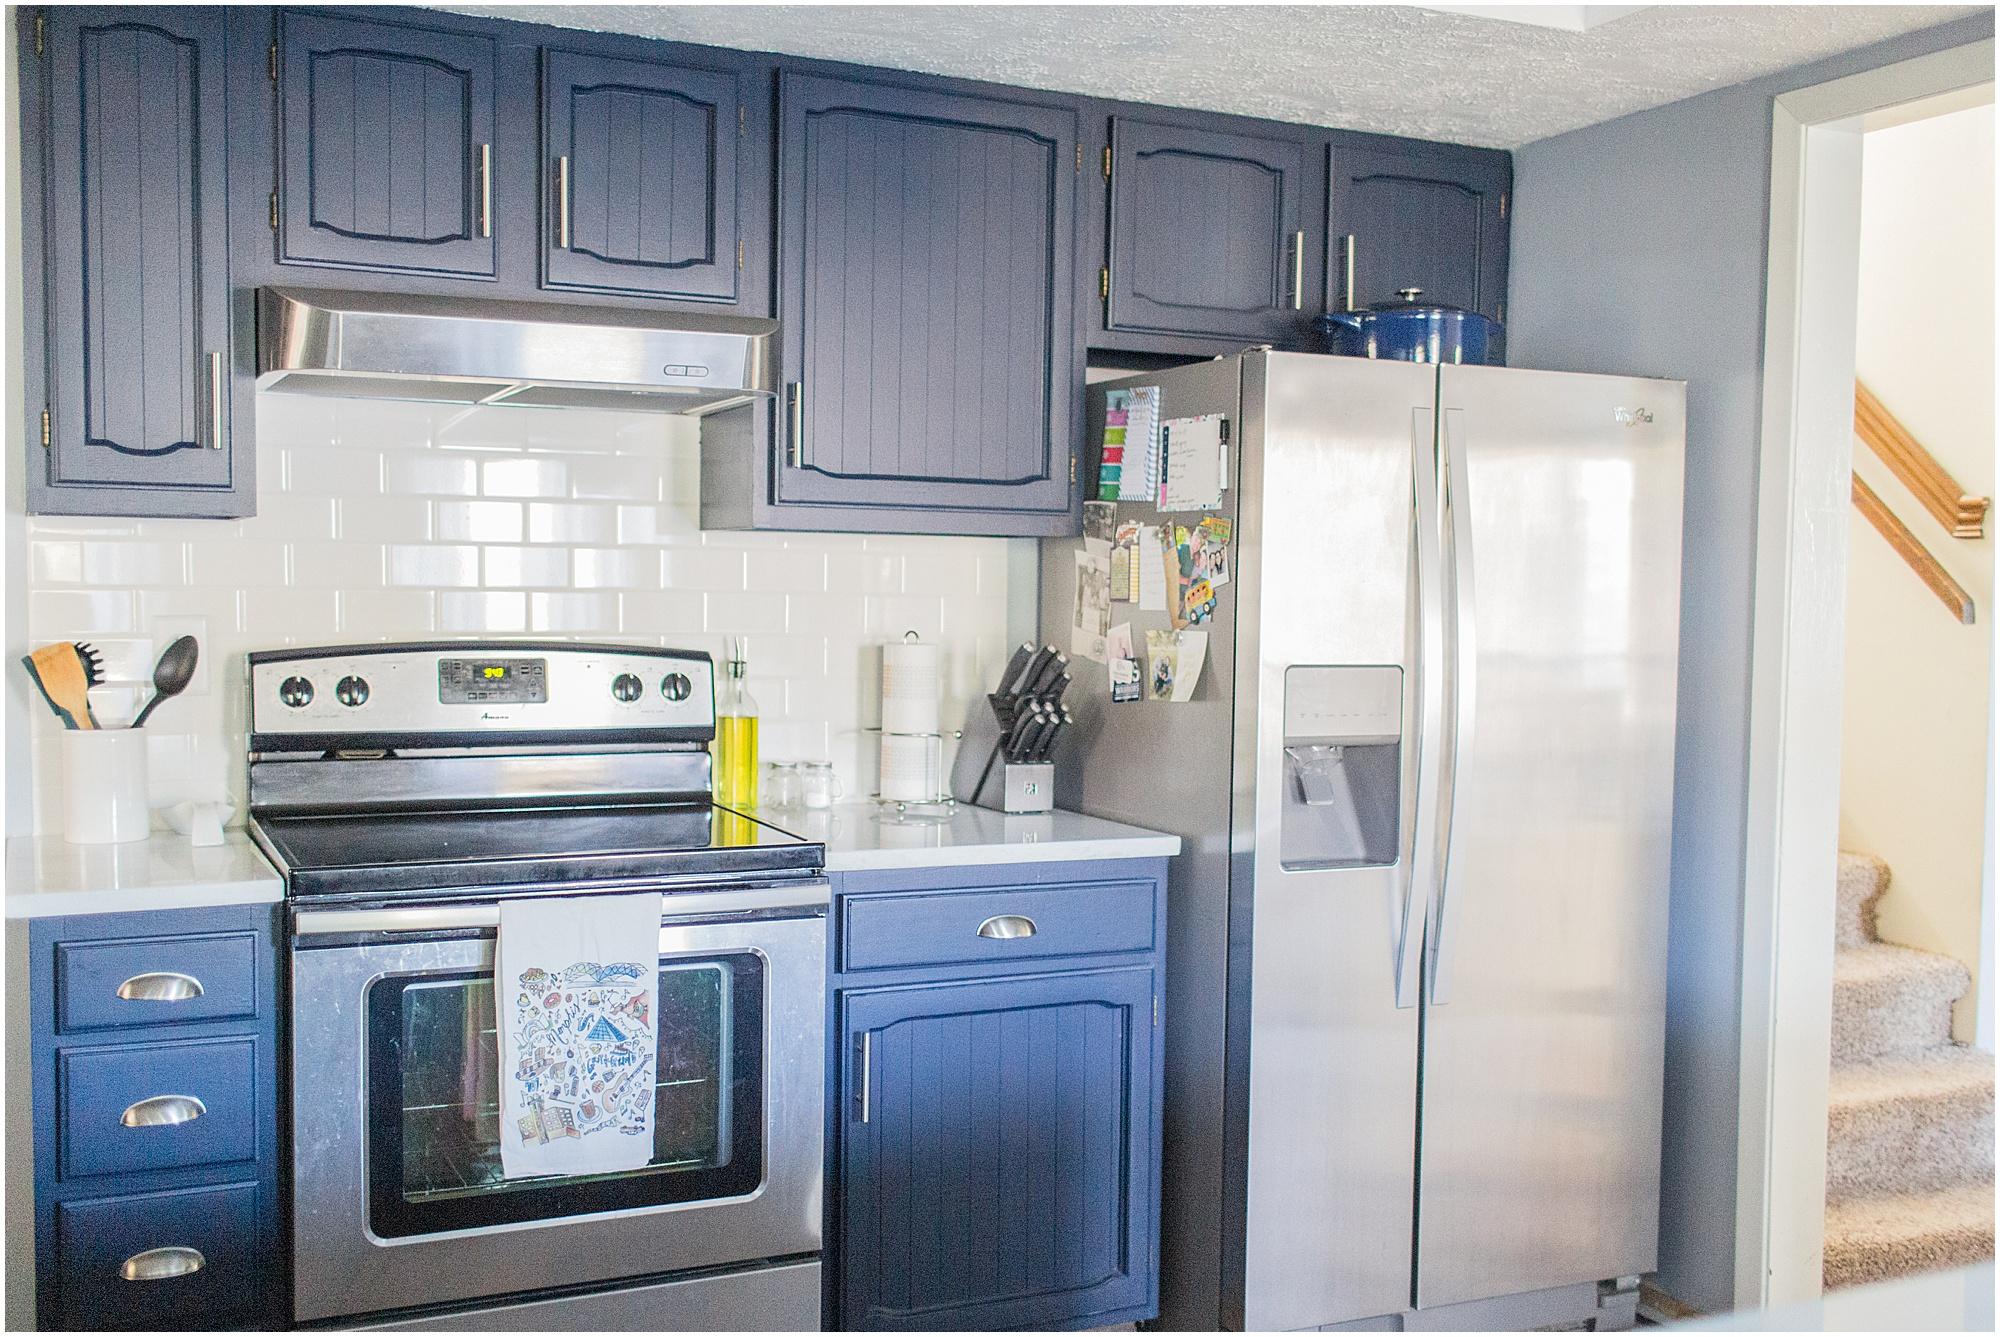 hambick-house-kitchen-renovation-fixer-upper_0016.jpg